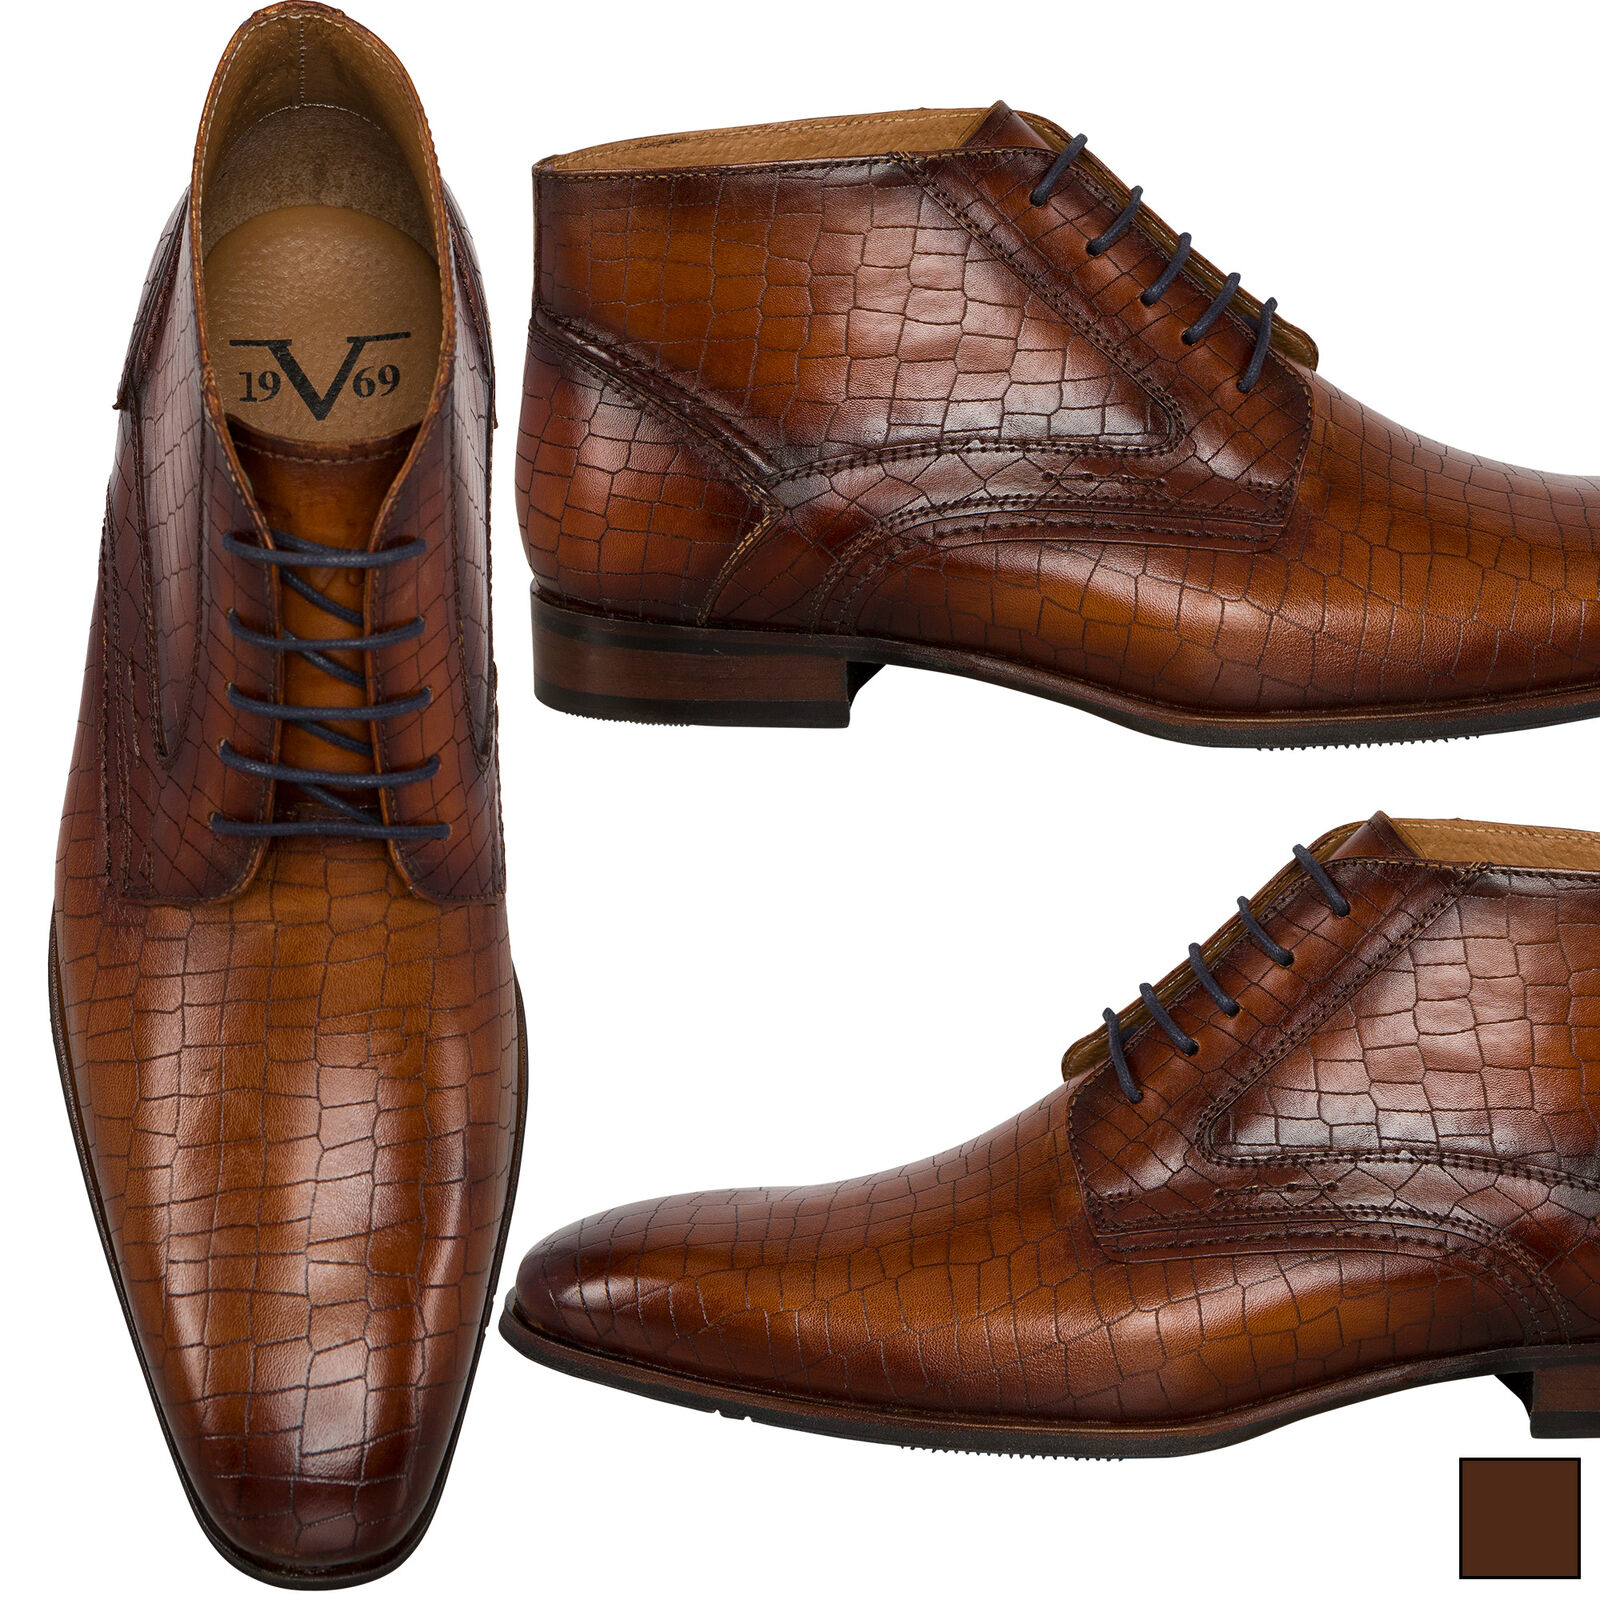 19V69 Versace 1969 Chelsea Stiefel Kroko-Style, Herren (V46)